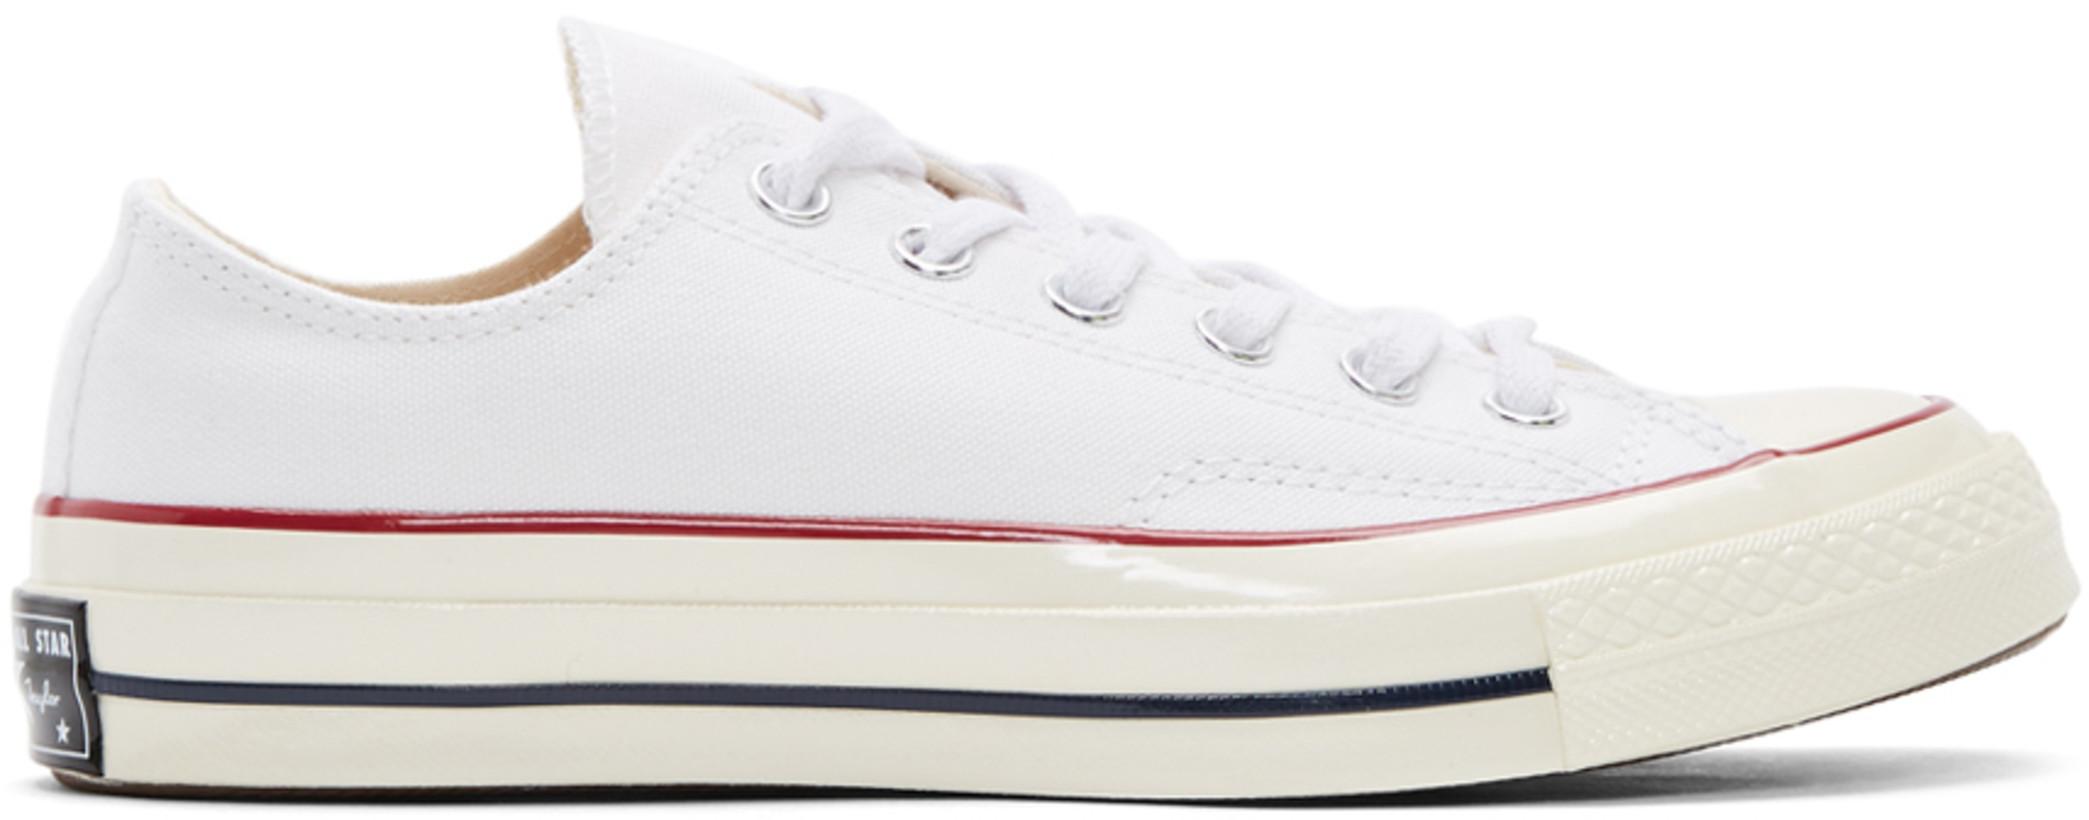 Converse ホワイト Chuck 70 ロー スニーカー メンズ ¥9460.5 JPY